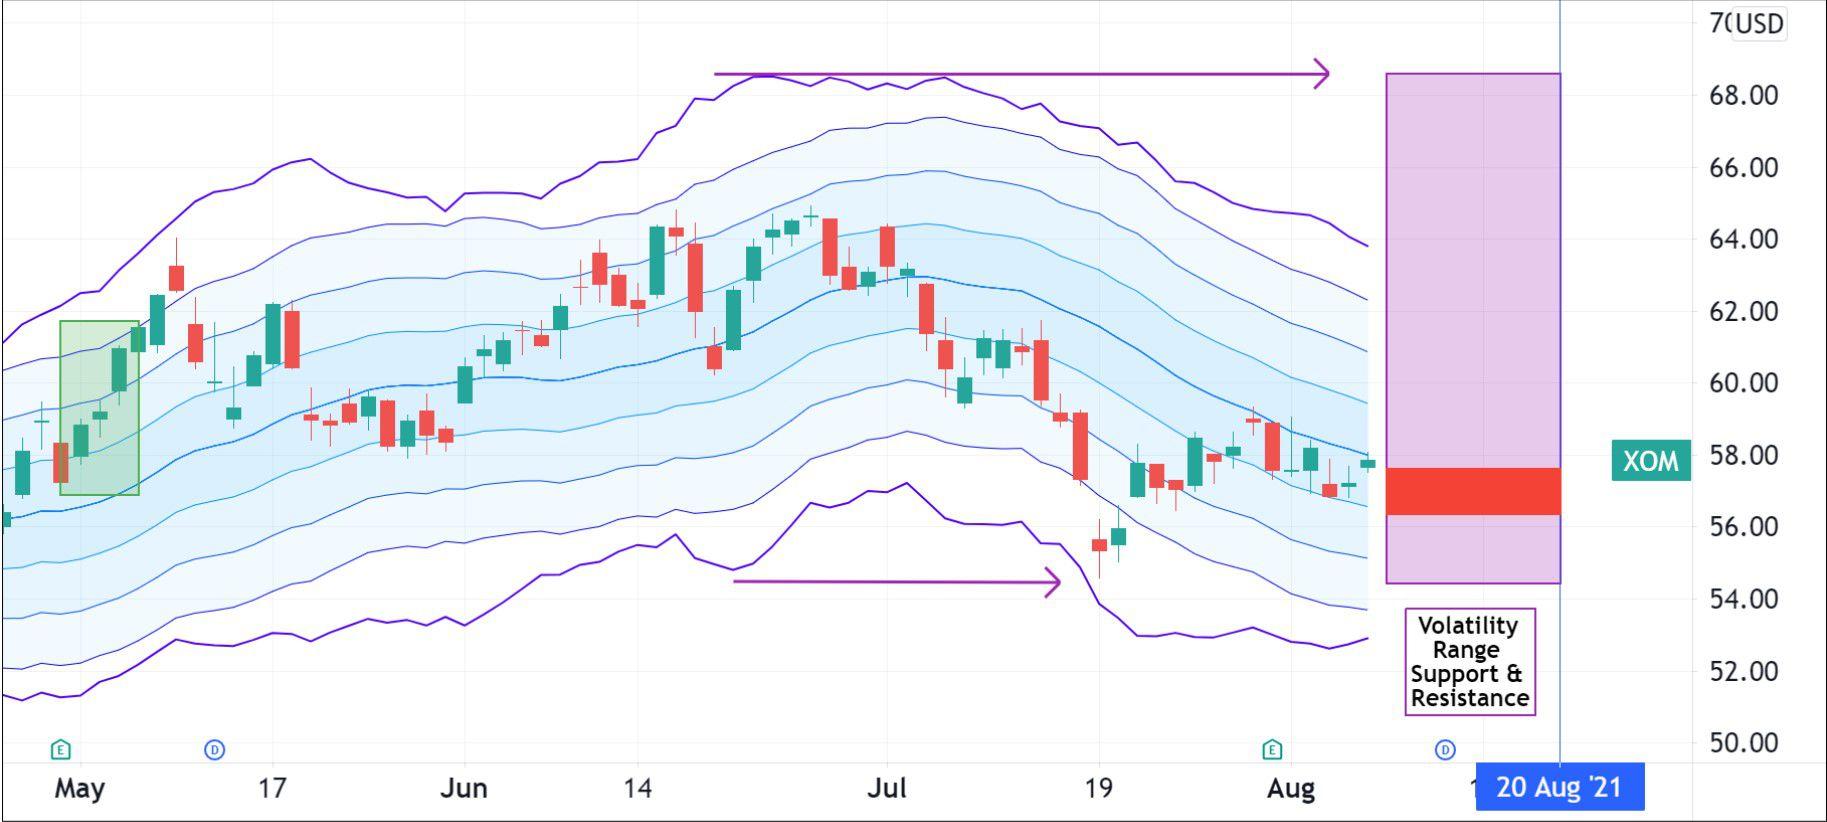 Volatility pattern for Exxon Mobil Corporation (XOM)